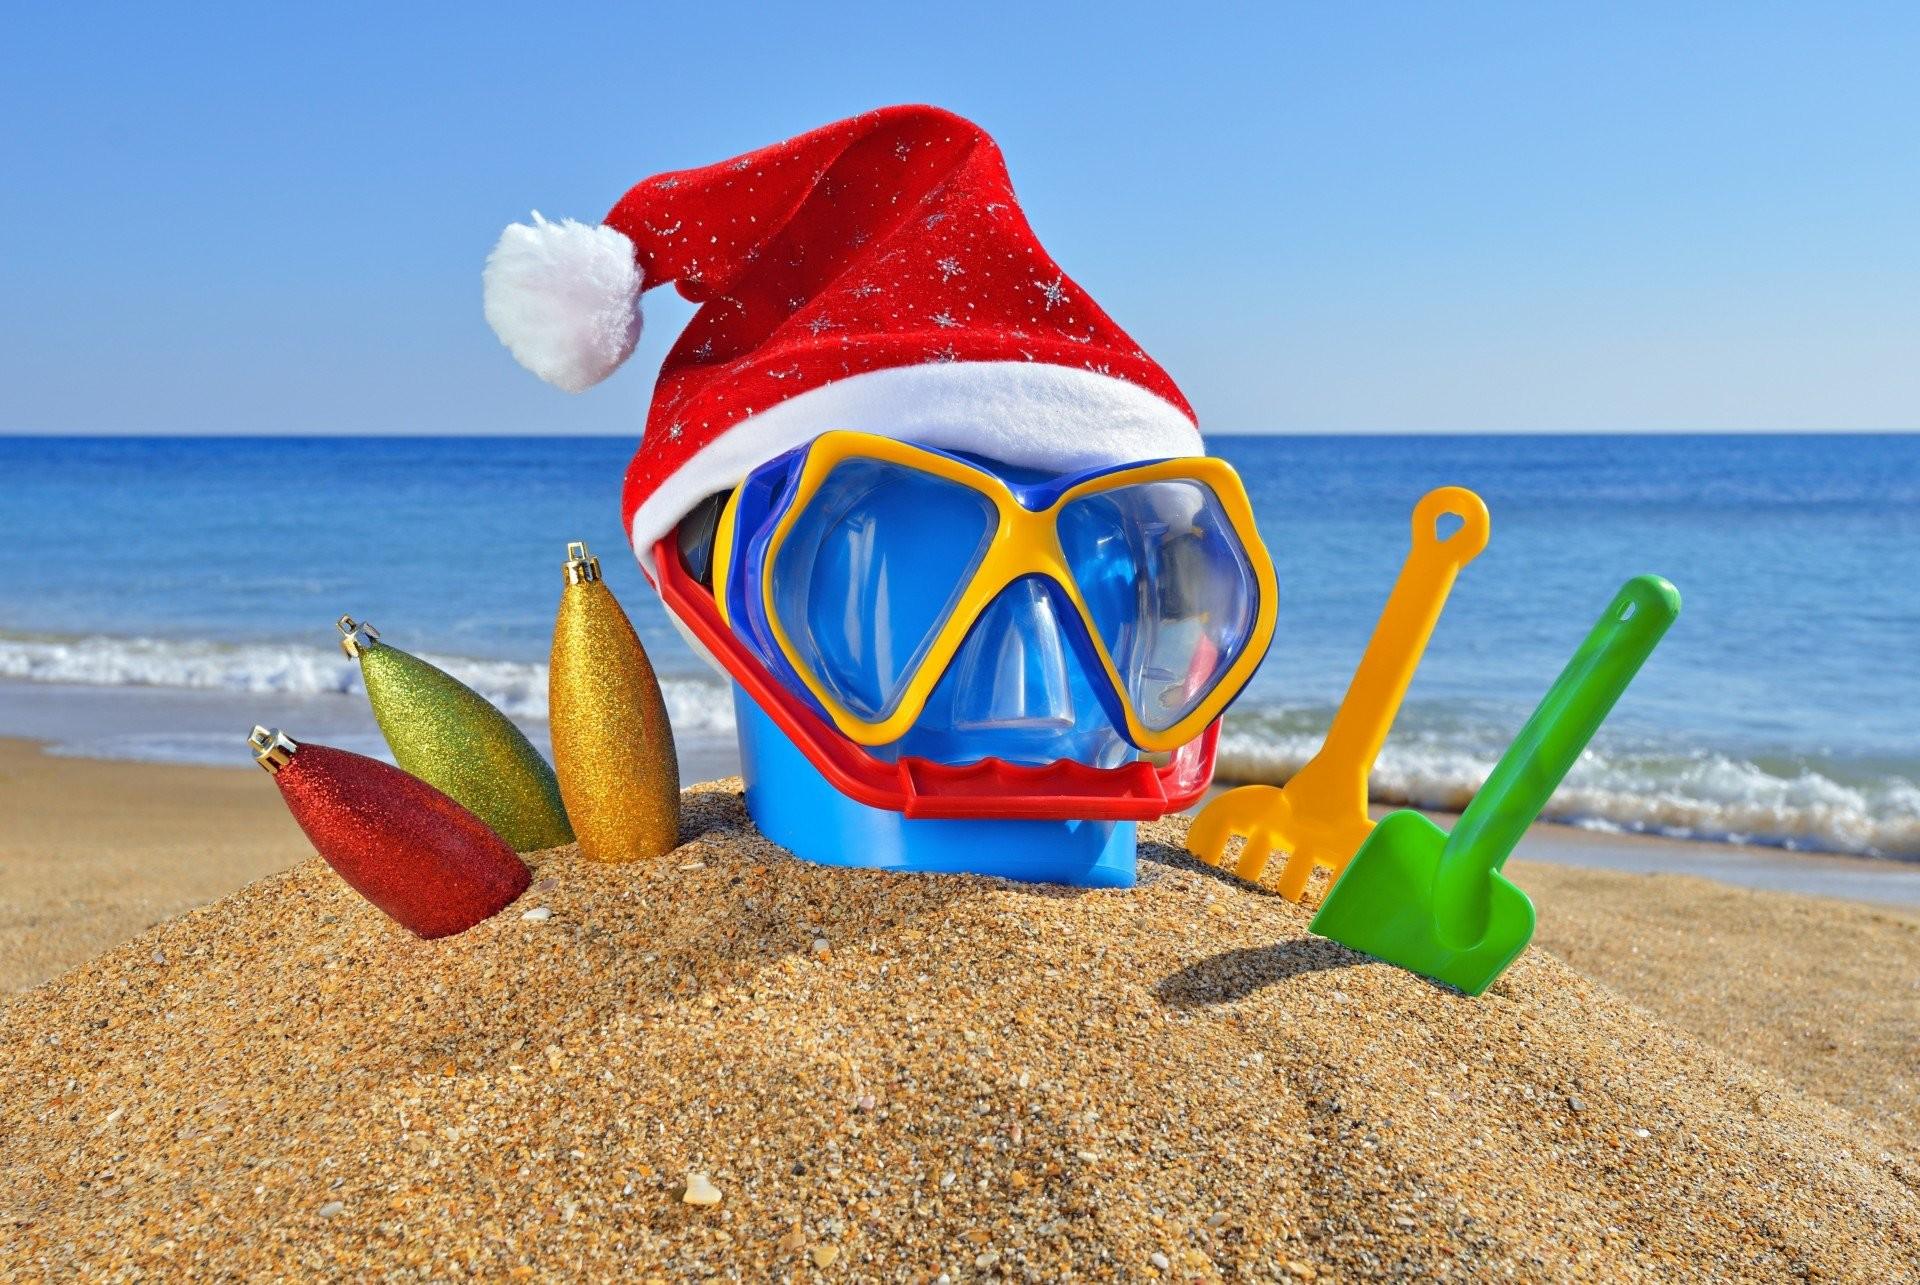 sand rakes christmas hat new year beach christmas glass sea ocean summer  toys hat sea sunglasses